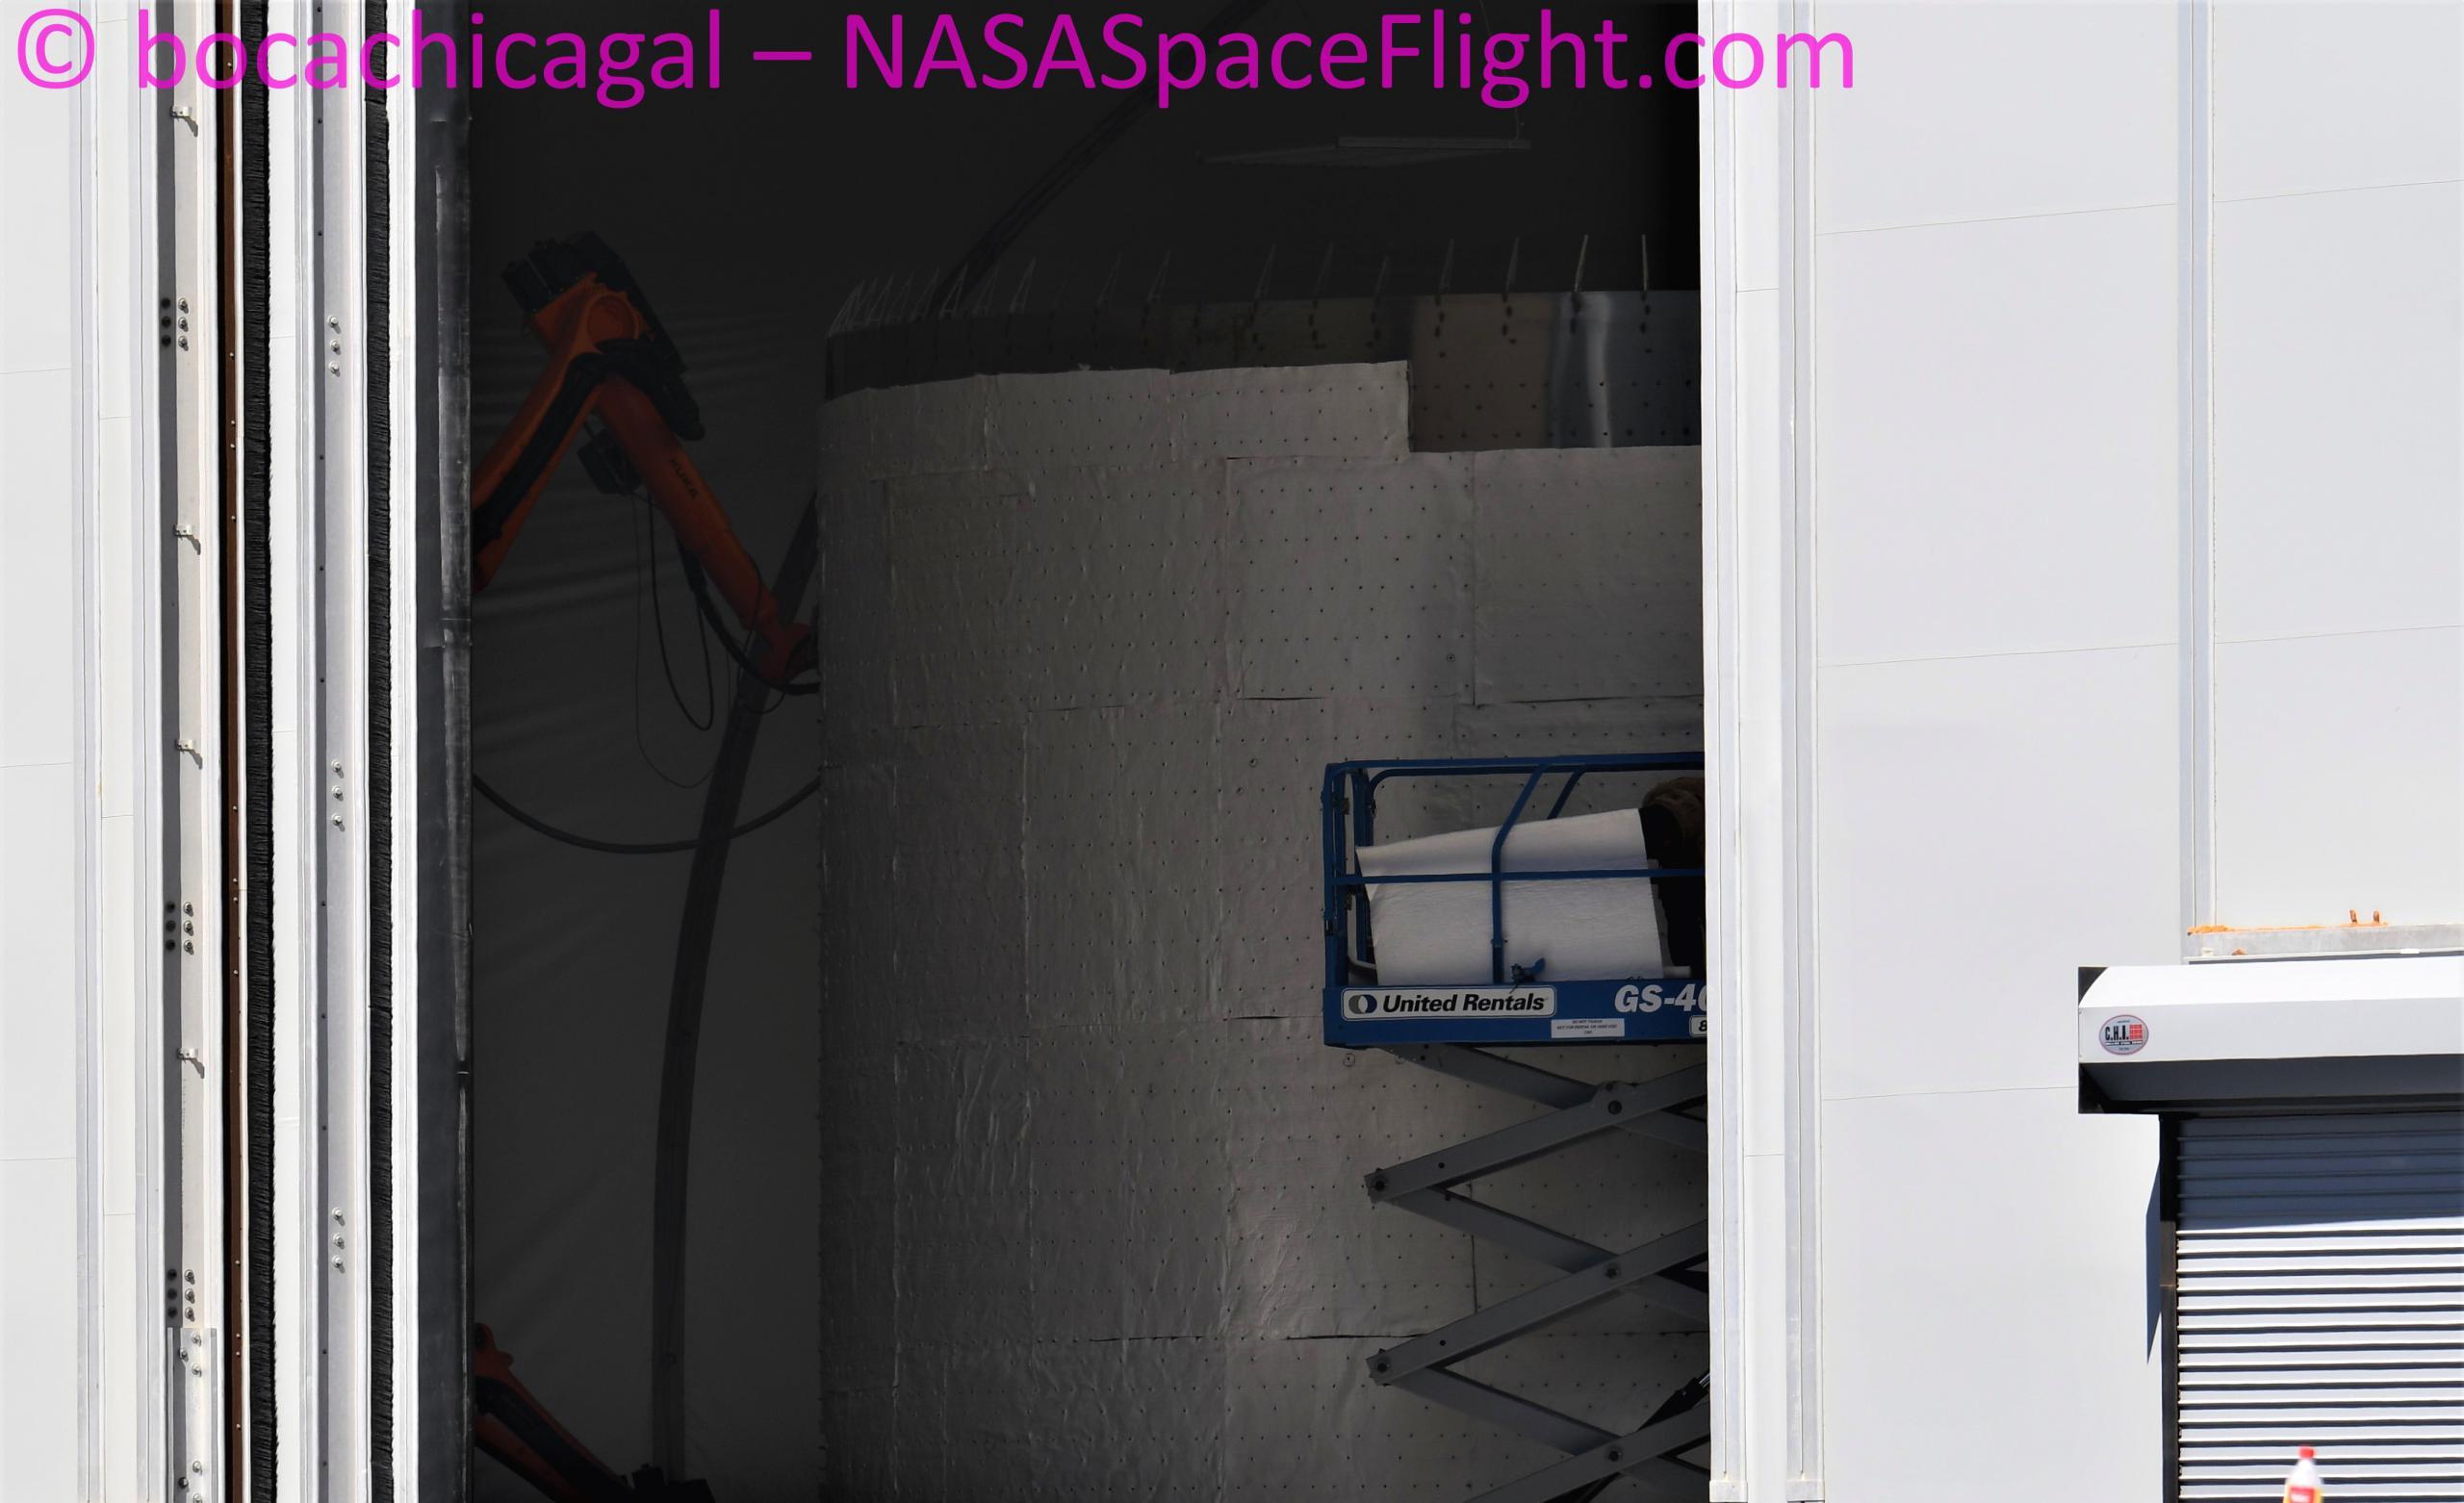 Starship Boca Chica 021921 (NASASpaceflight – bocachicagal) full heat shield install prep 2 crop (c)